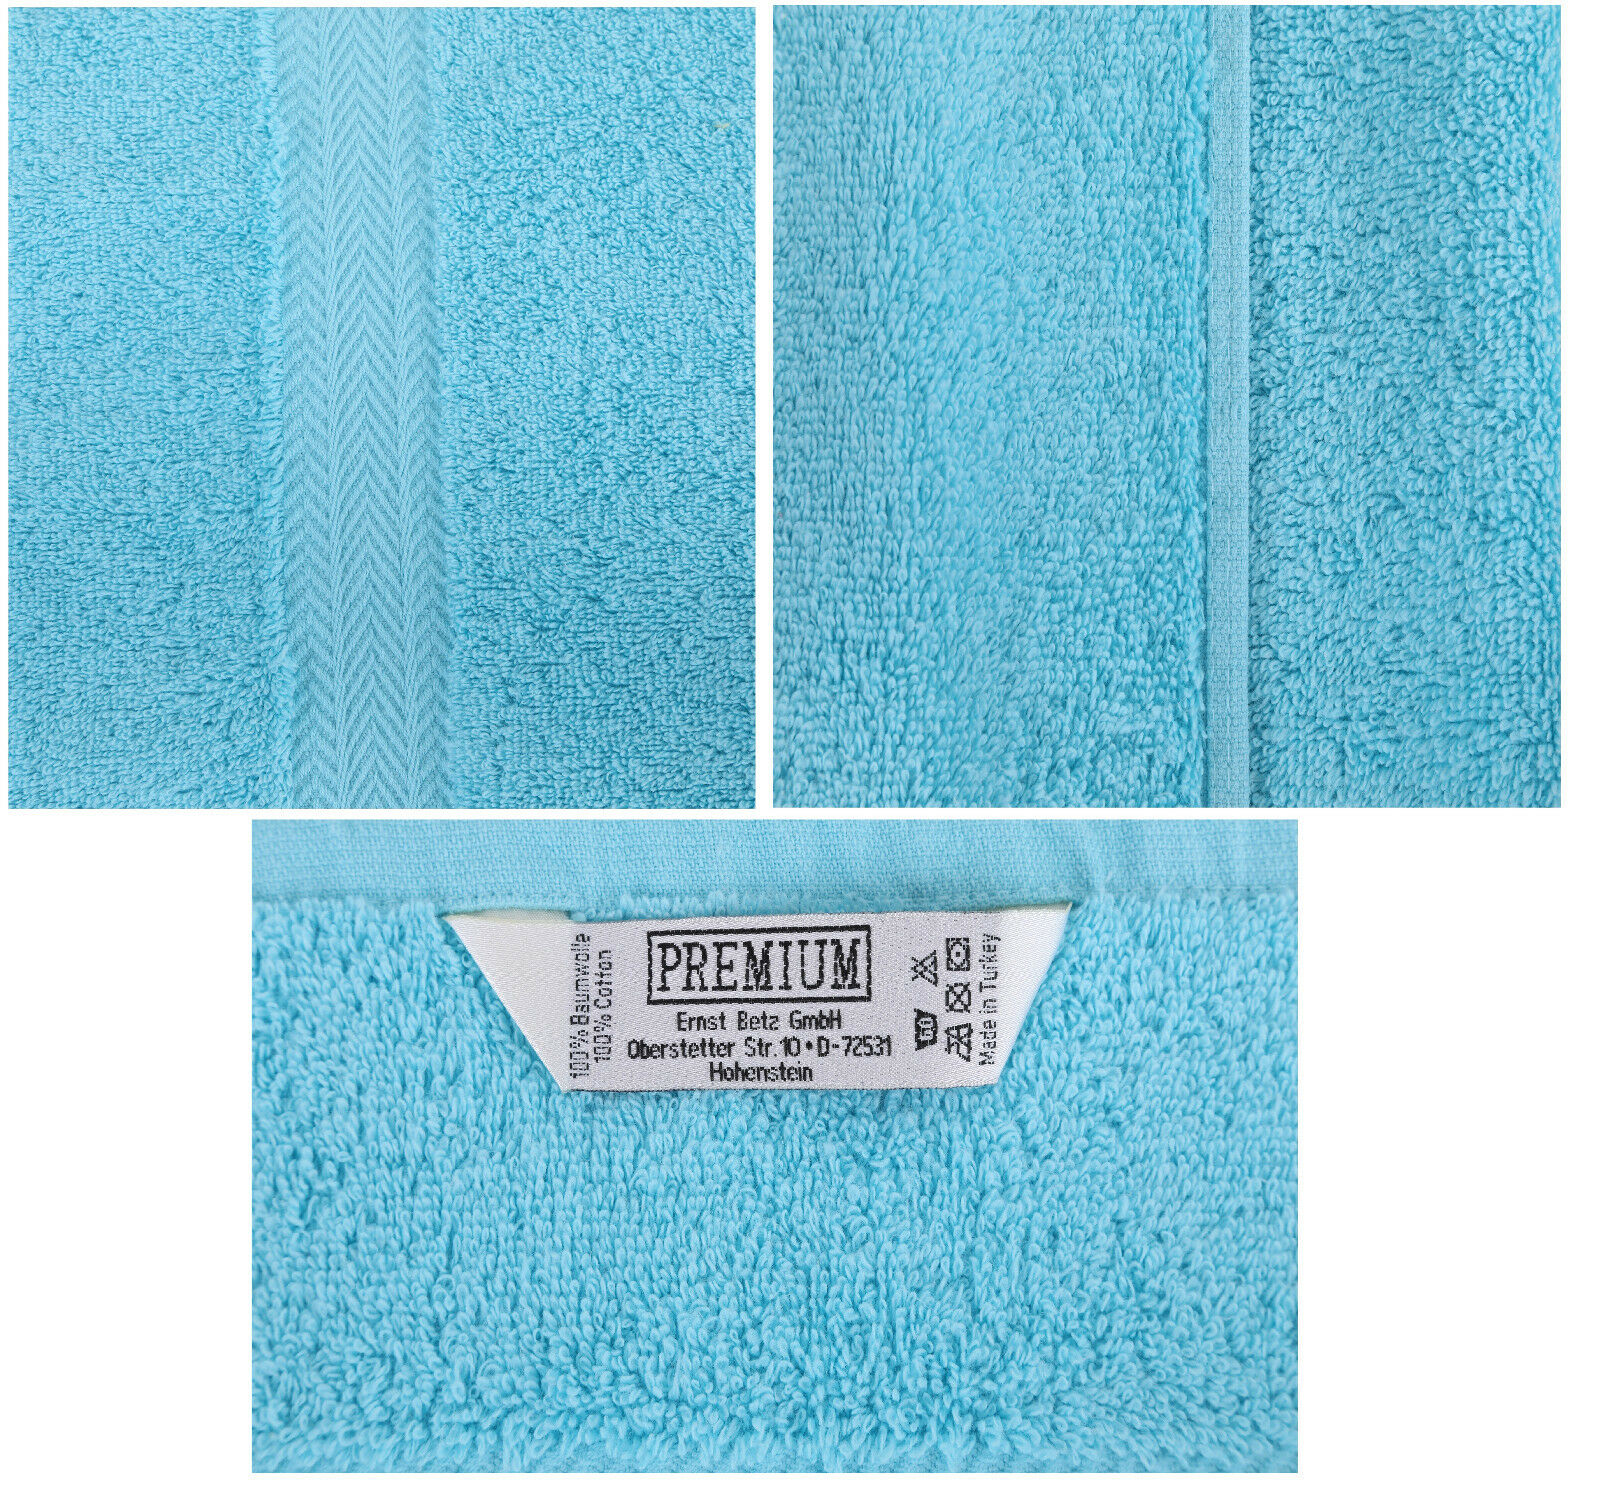 Betz 10 pezzi pezzi pezzi Handtuchset Premium Arancione & Turchese 100% COTONE b86729